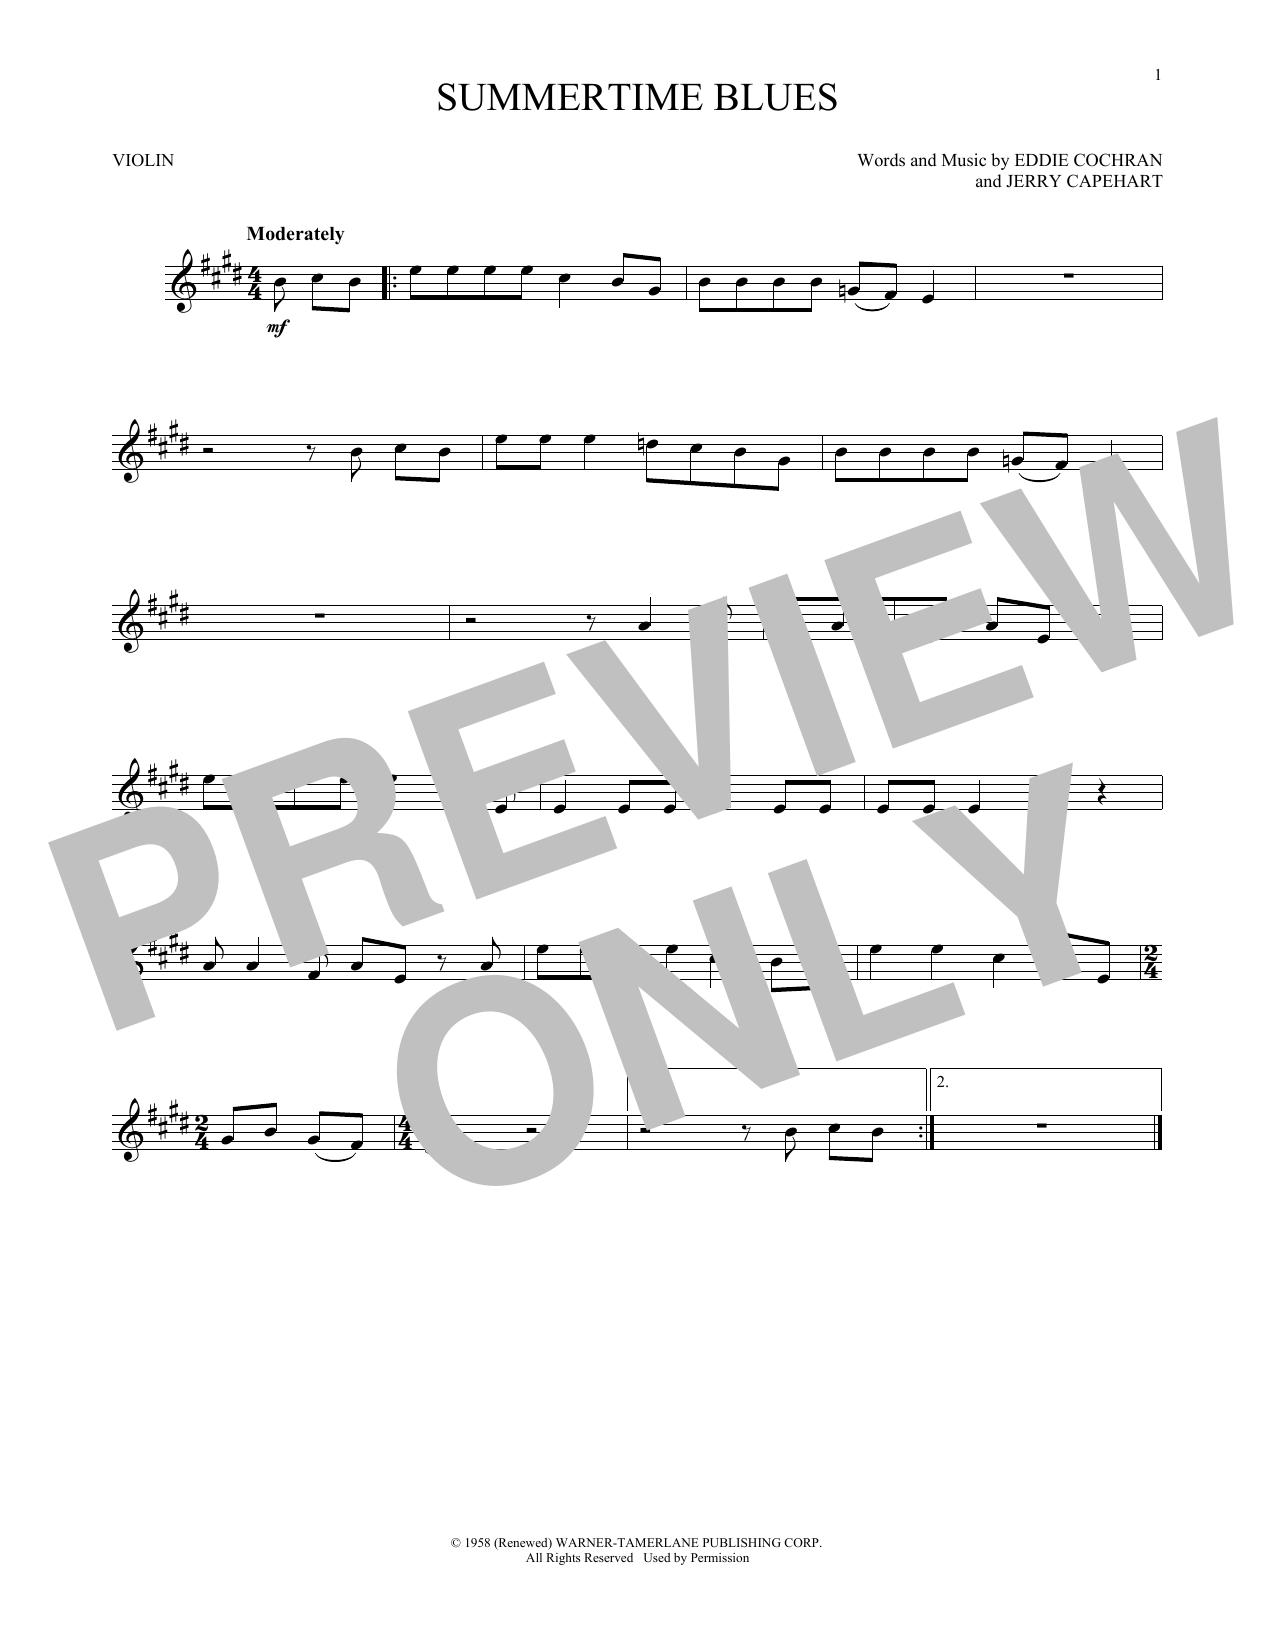 Summertime Blues (Violin Solo)